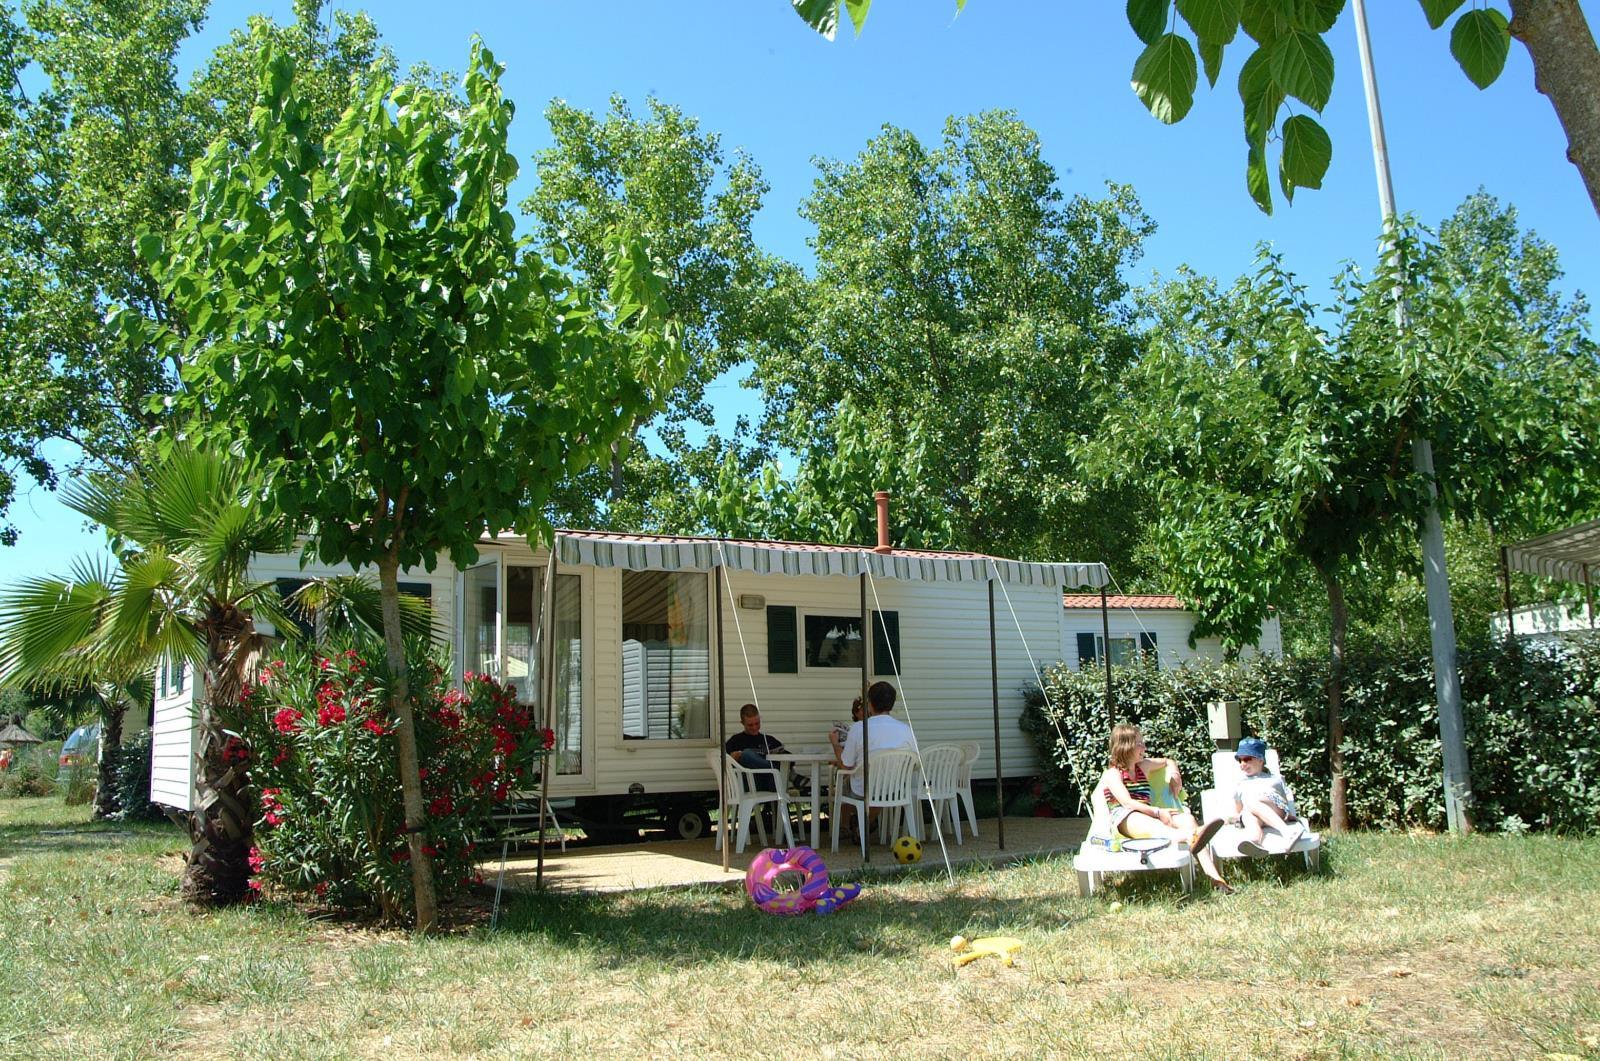 Location - Tampico, Confort- Samedi - 2 Chambres - Camping L'Air Marin